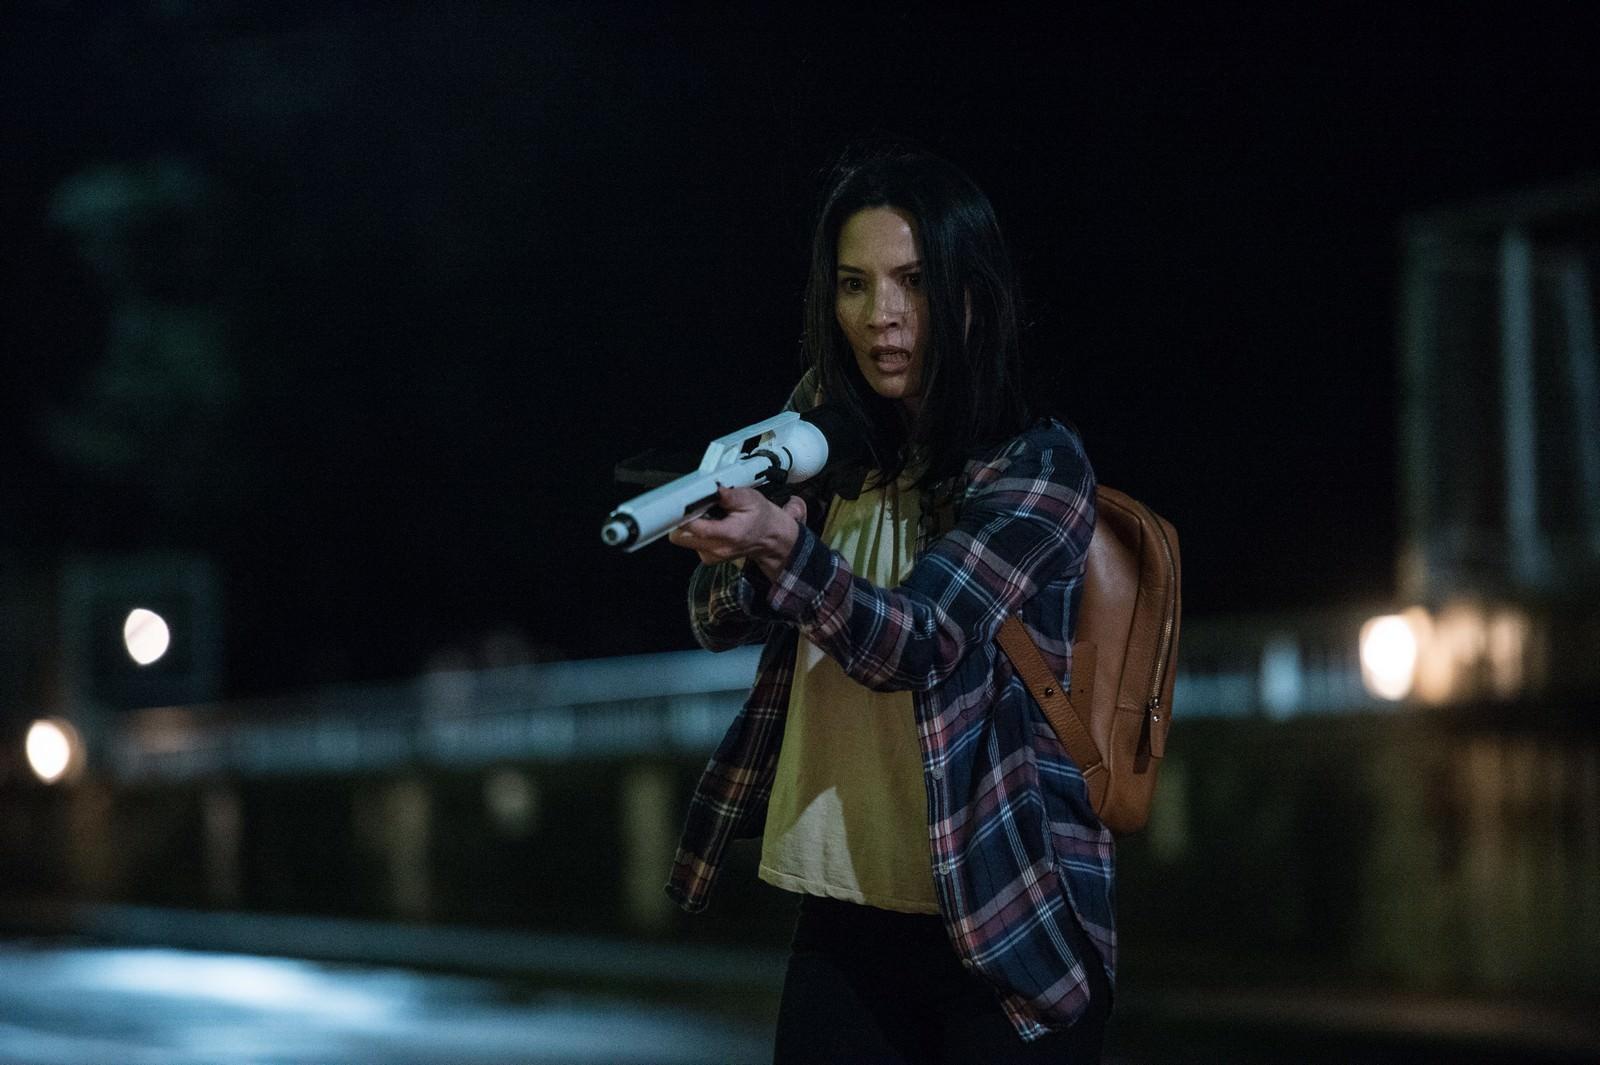 Movie, The Predator(美國, 2018) / 終極戰士:掠奪者(台) / 铁血战士(中) / 鐵血戰士:血獸進化(港), 電影劇照